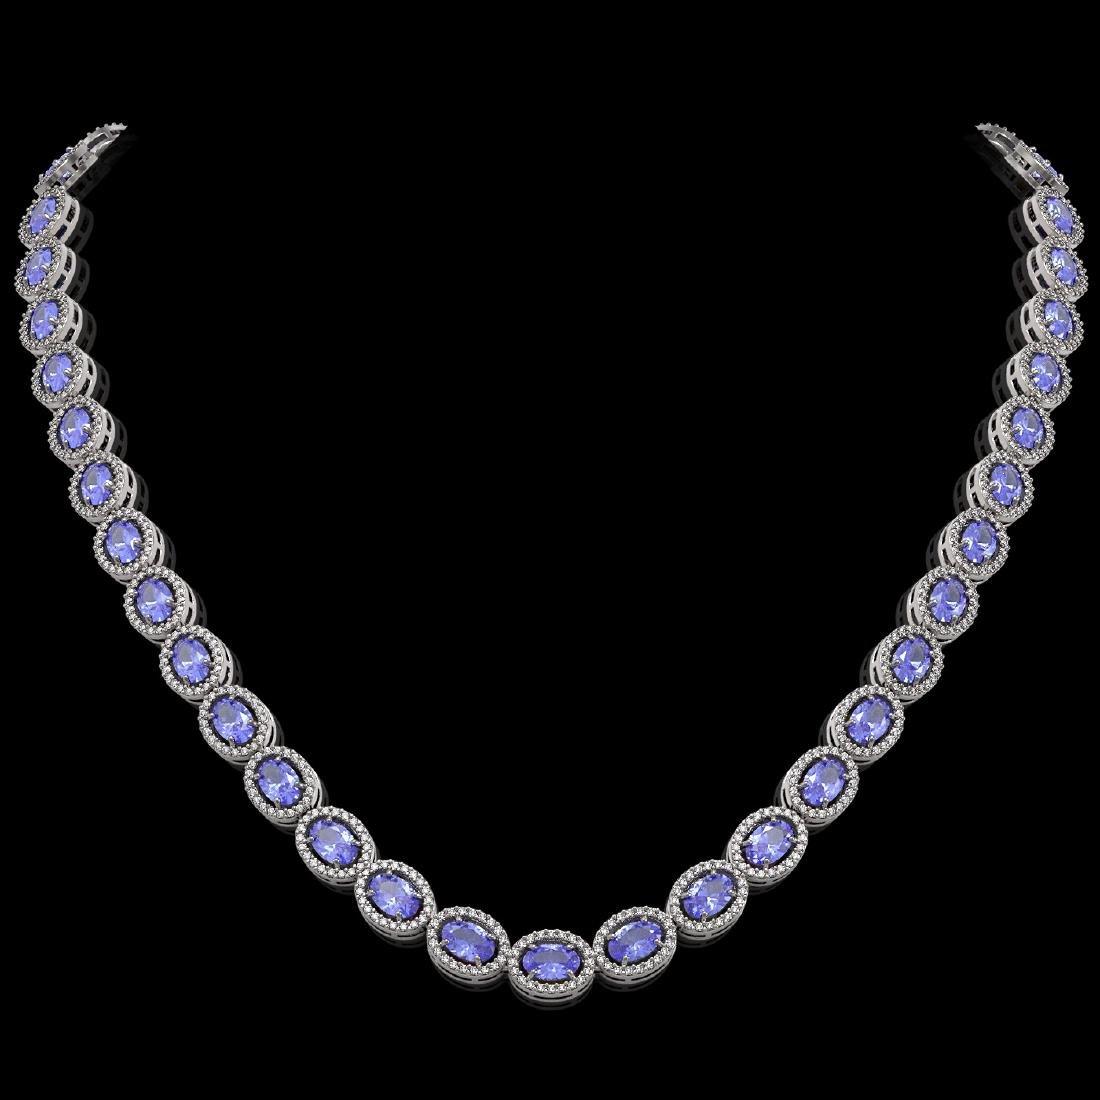 31.96 CTW Tanzanite & Diamond Halo Necklace 10K White